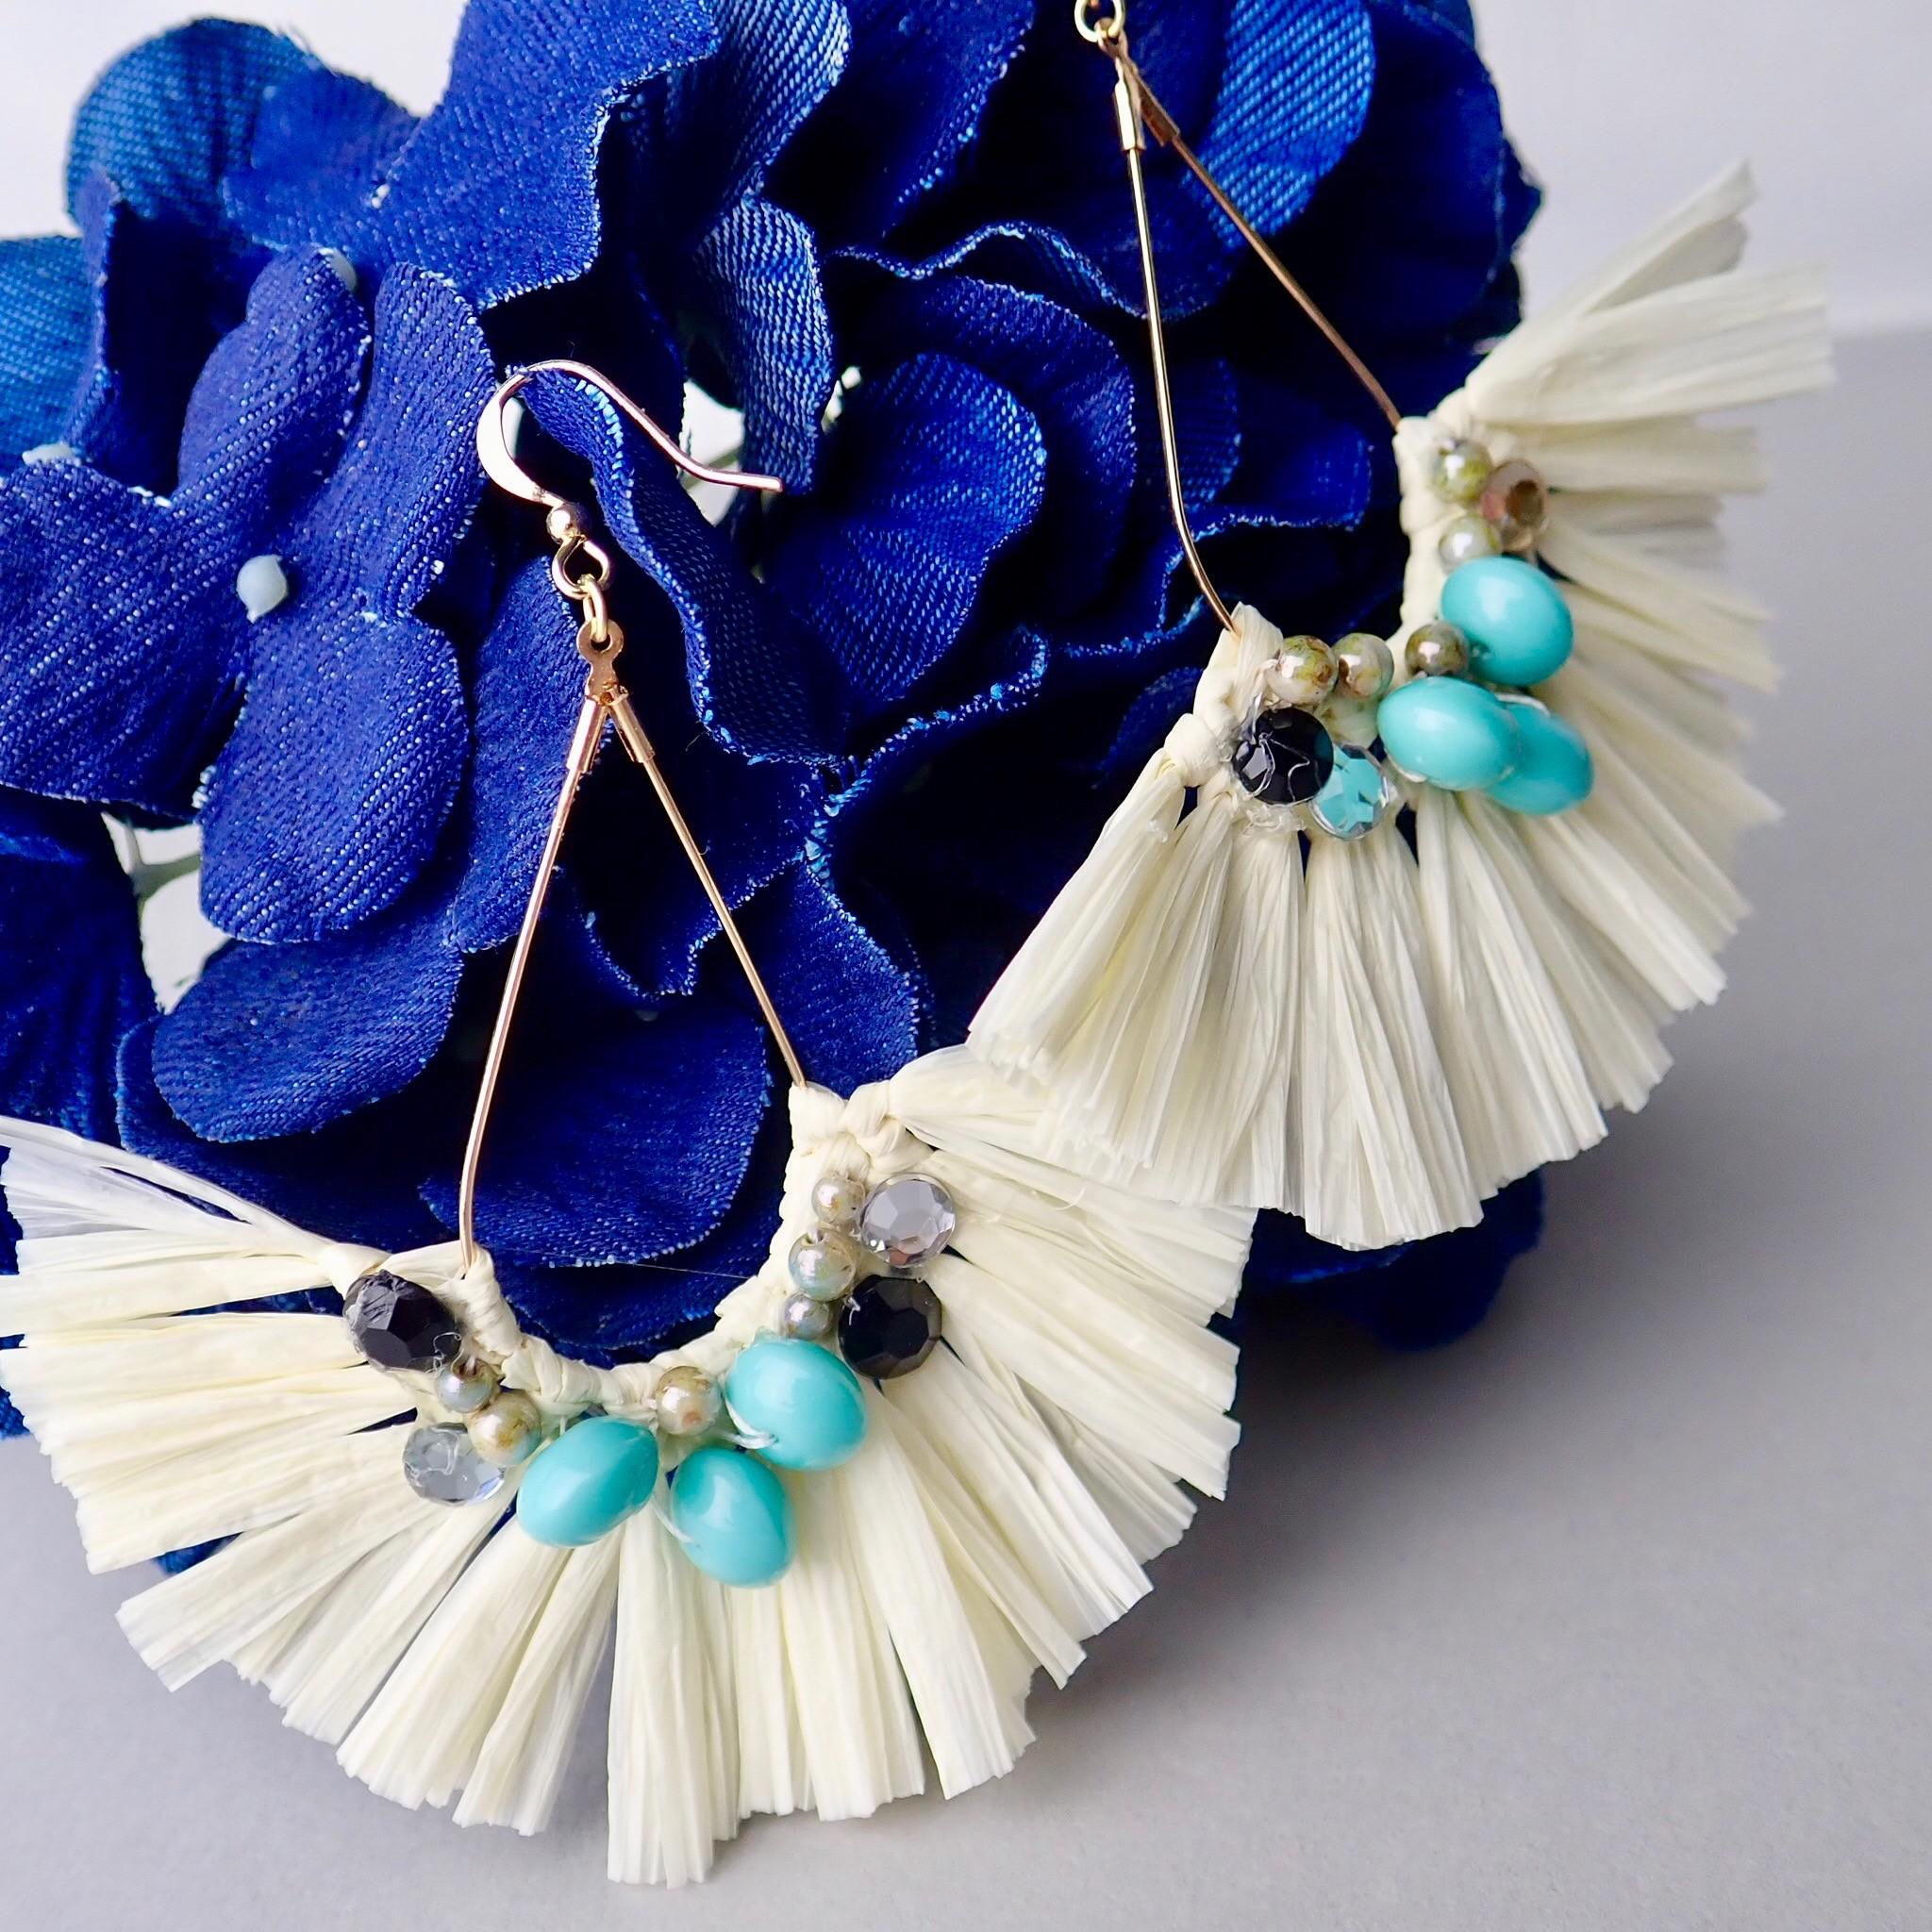 WechatIMG845 - 究極の手芸糸コットンラフィアはアクセも作れる❗❓